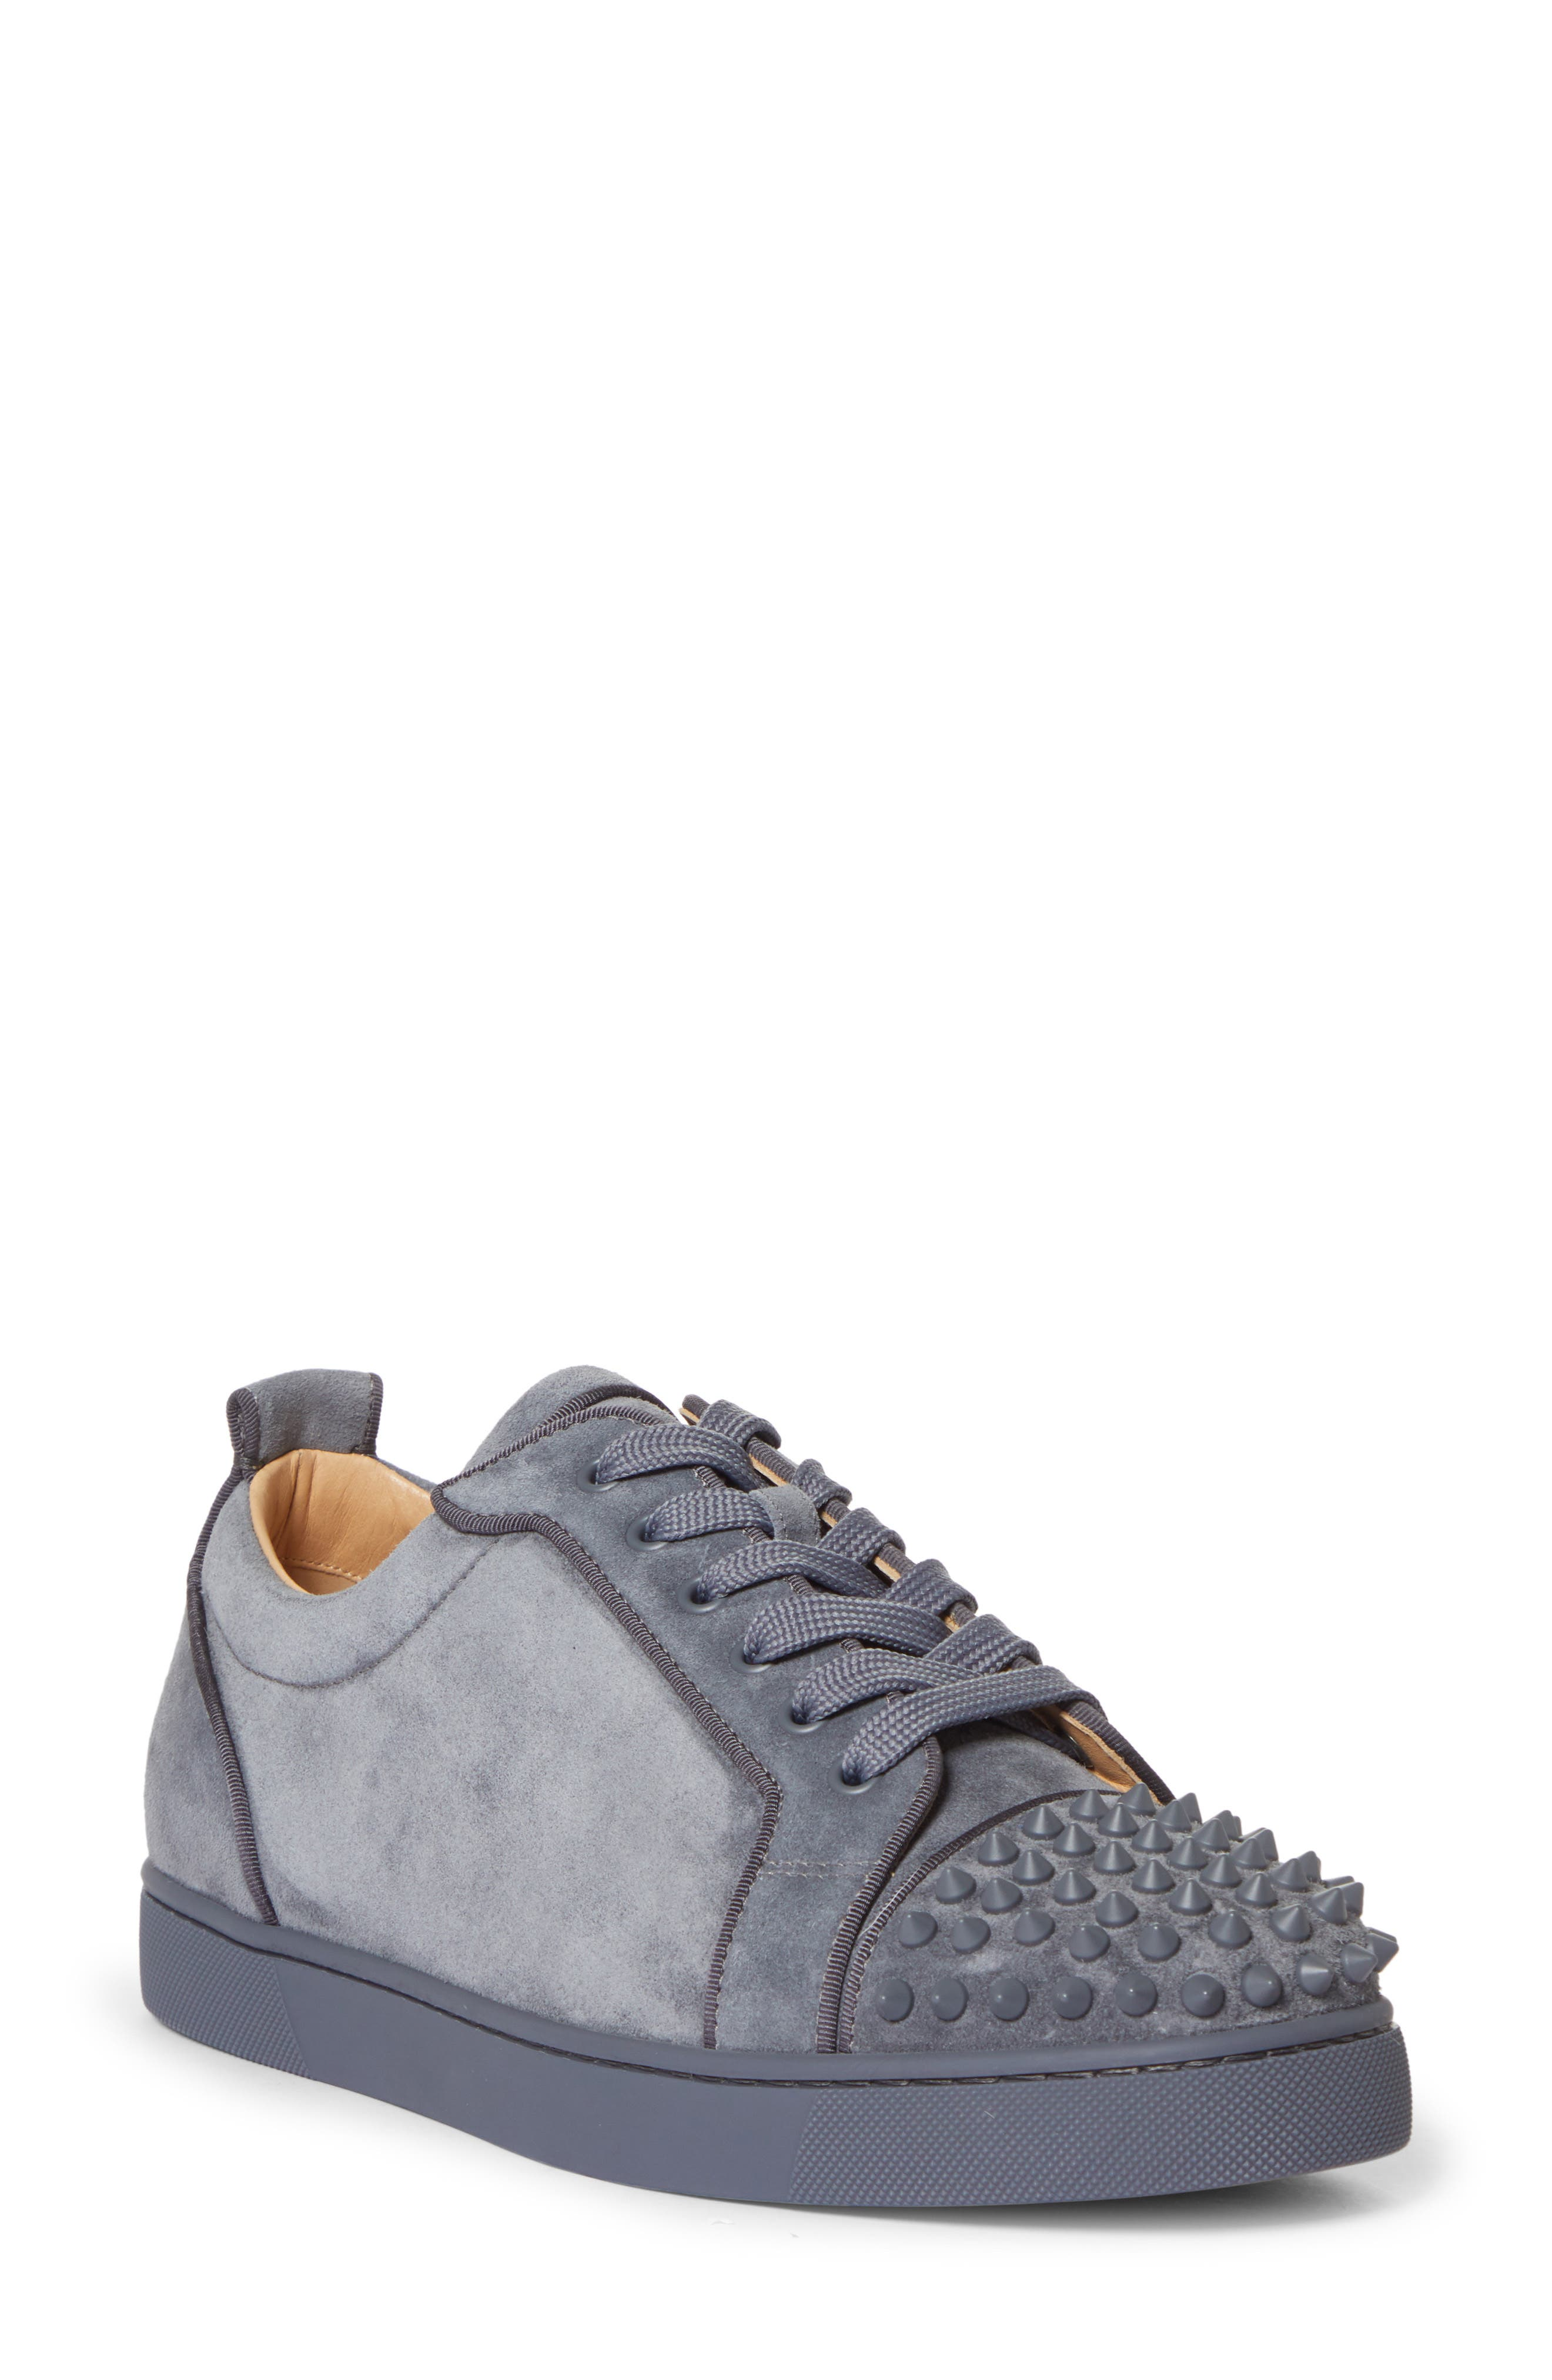 Men's Christian Louboutin Louis Junior Spikes Sneaker